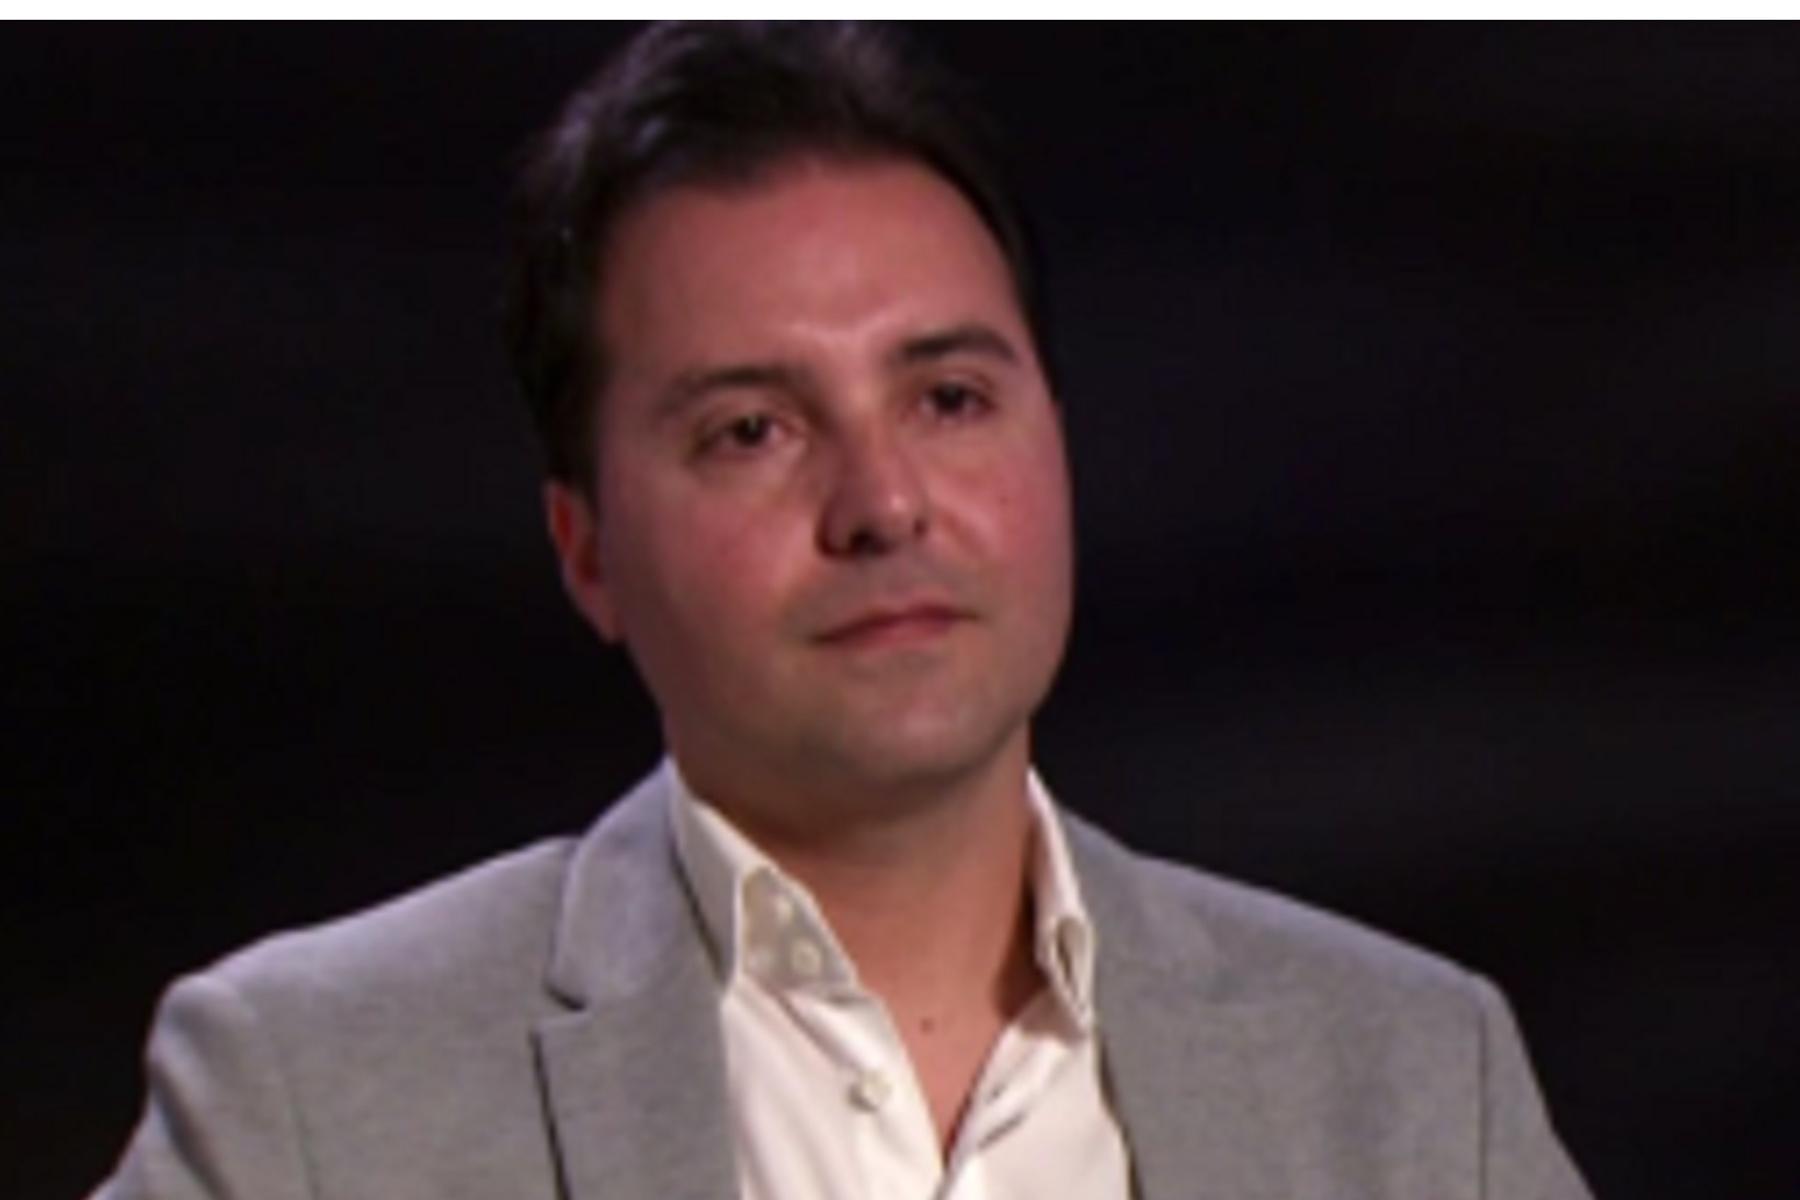 Salvo Riina sbarca su Facebook, Saviano: la mafia sta parlando